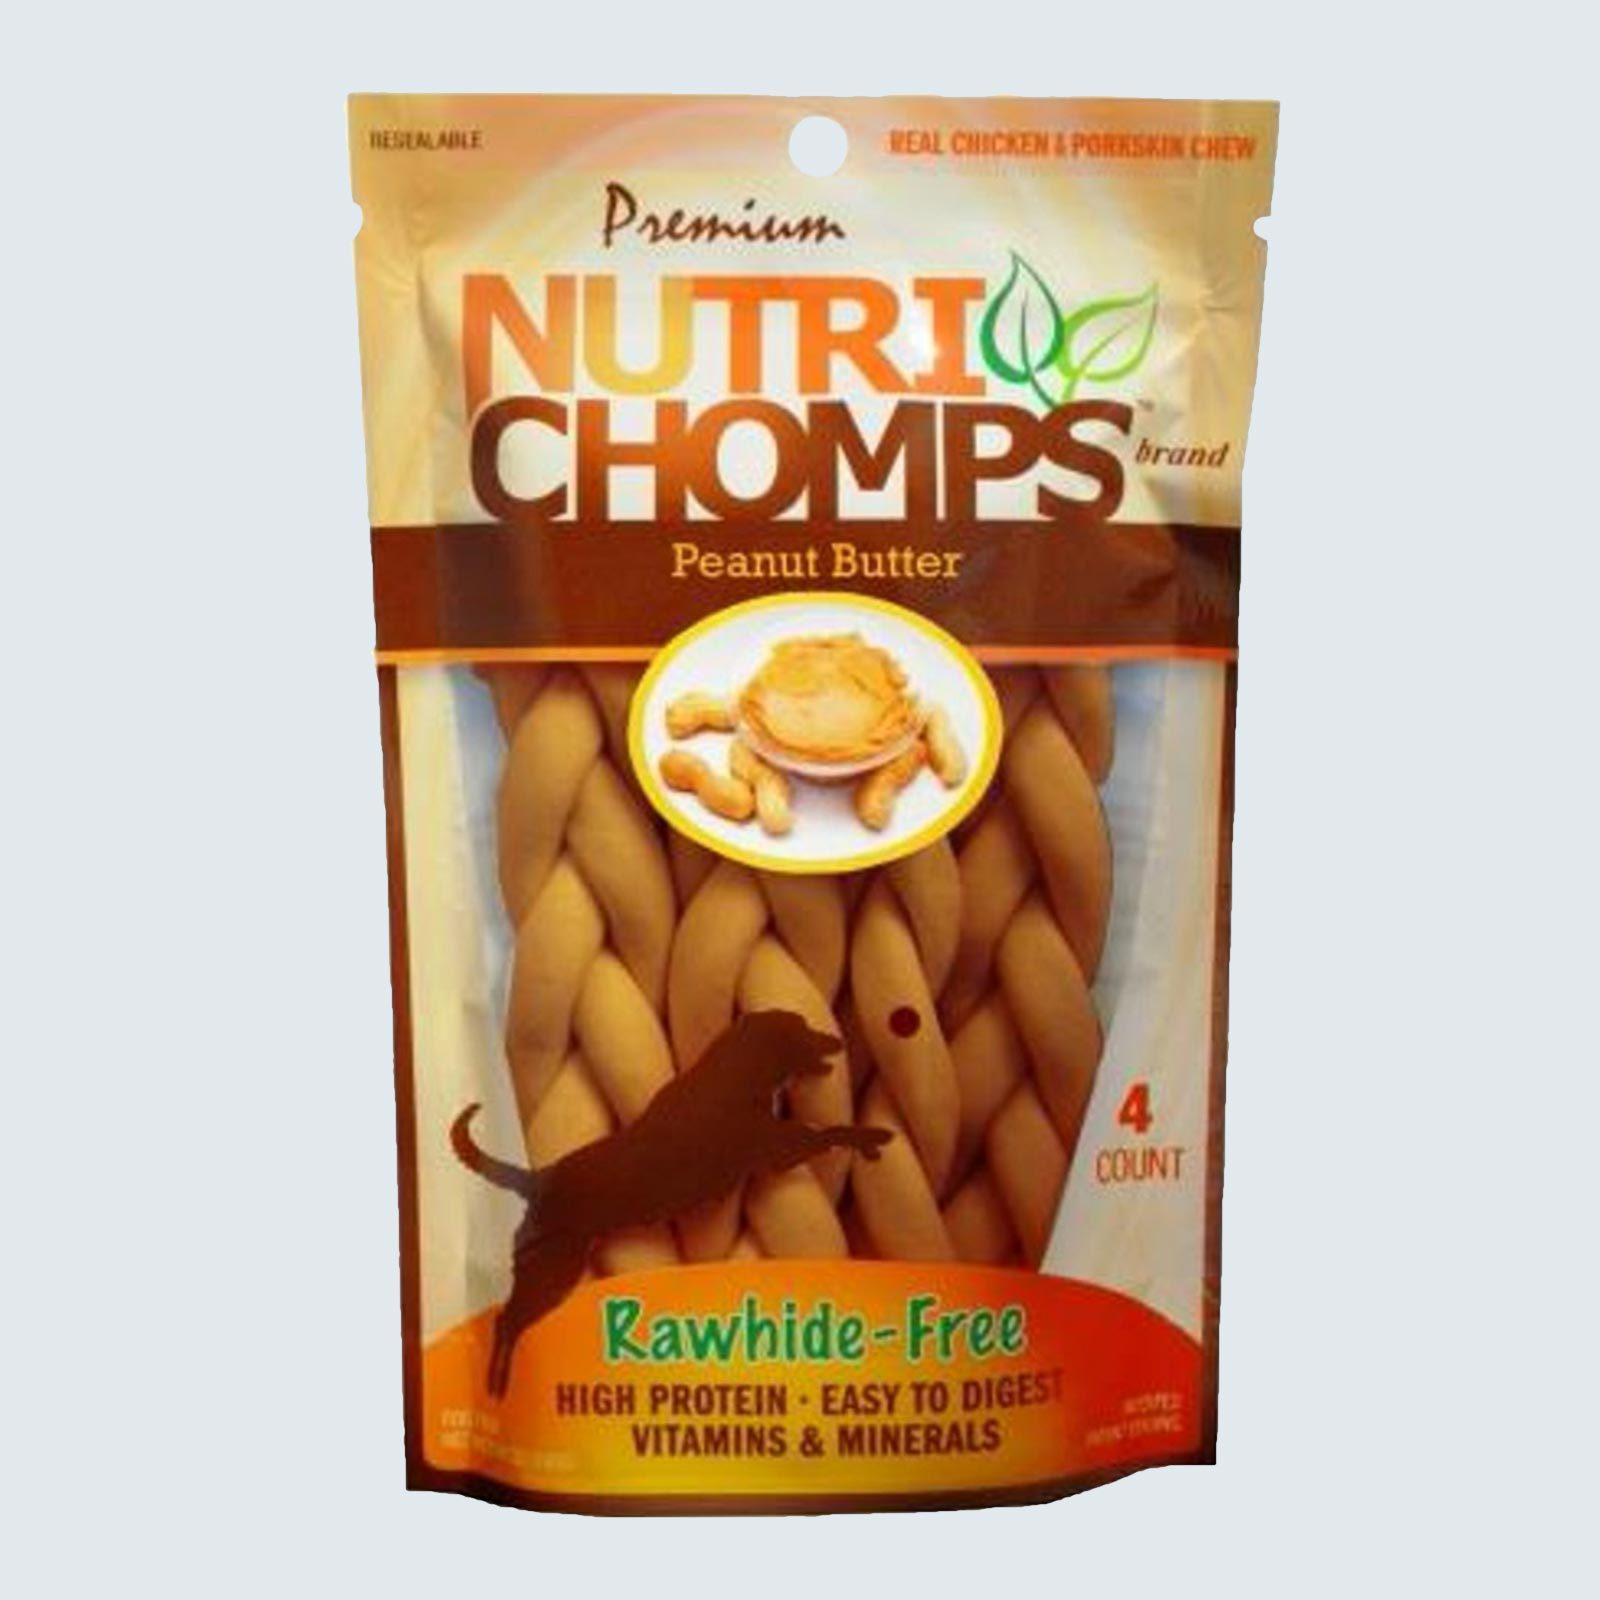 Nutri Chomps Rawhide-Free Peanut Butter Braids